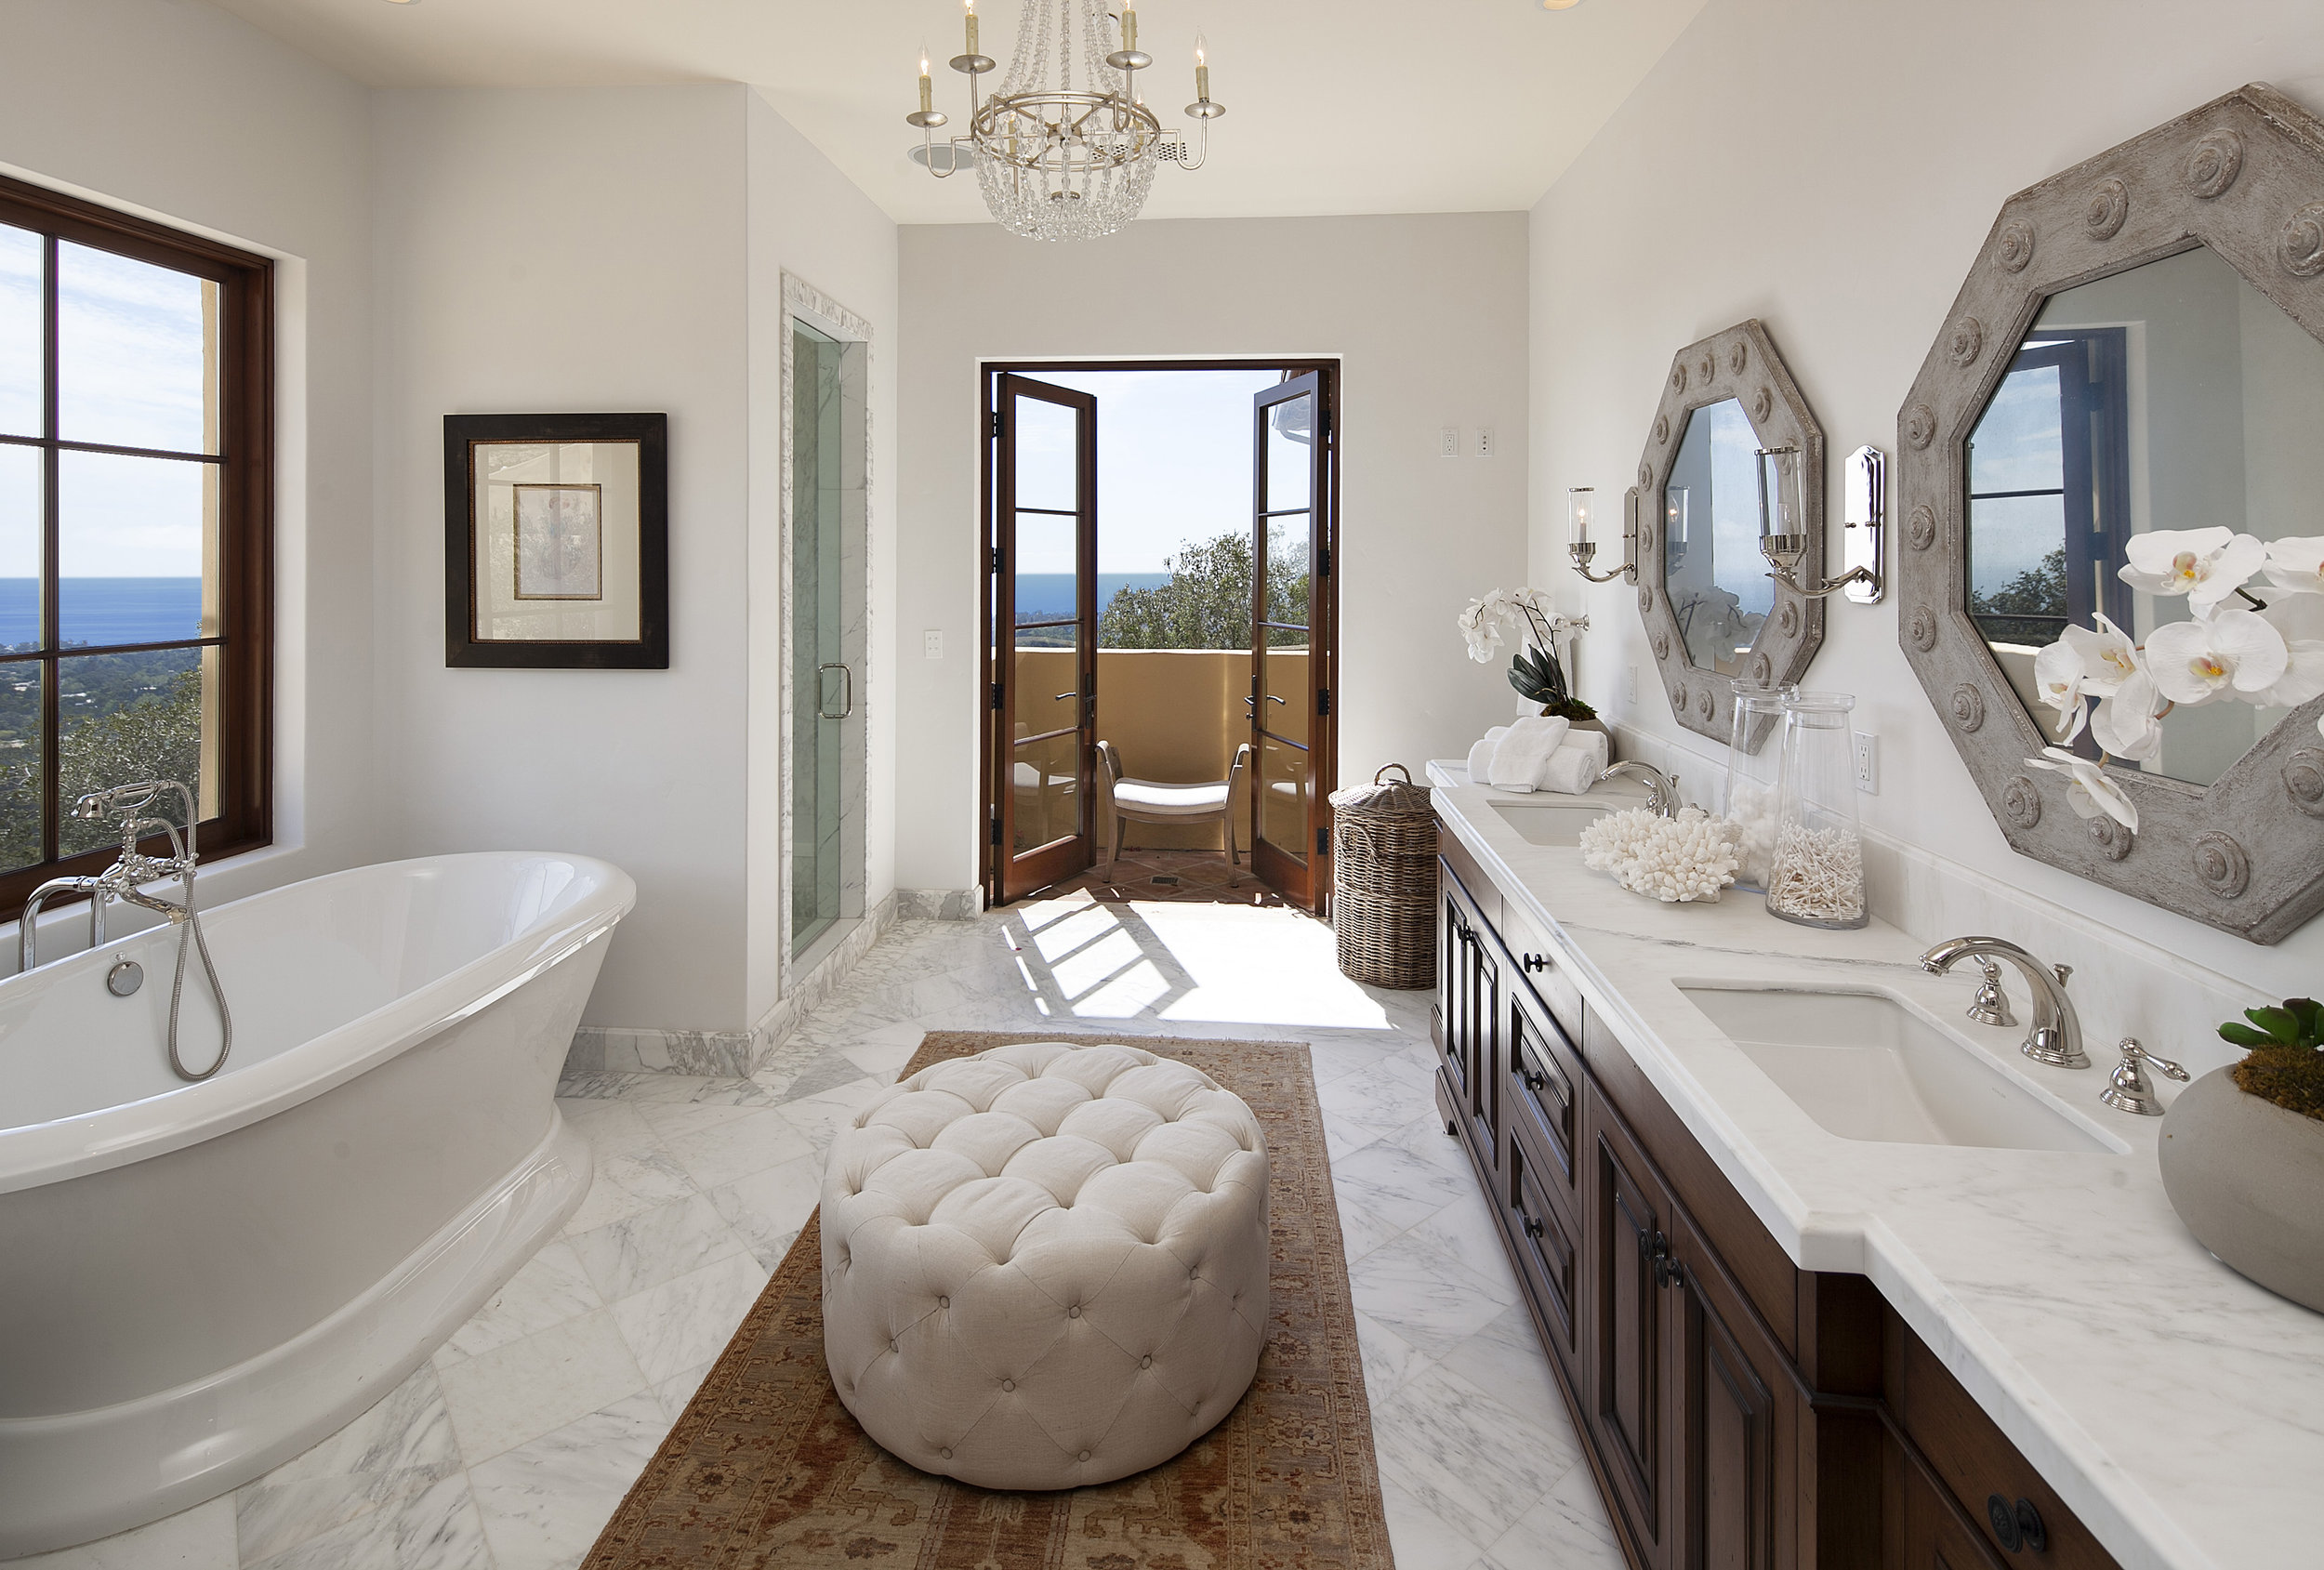 Property for Sale: 1398 Oak Creek Canyon Road, Montecito, CA 93108 List Price: $12,250,000 6 Beds 6.5 Baths 8,075 Sq Ft Exquisite Ocean View Villa!